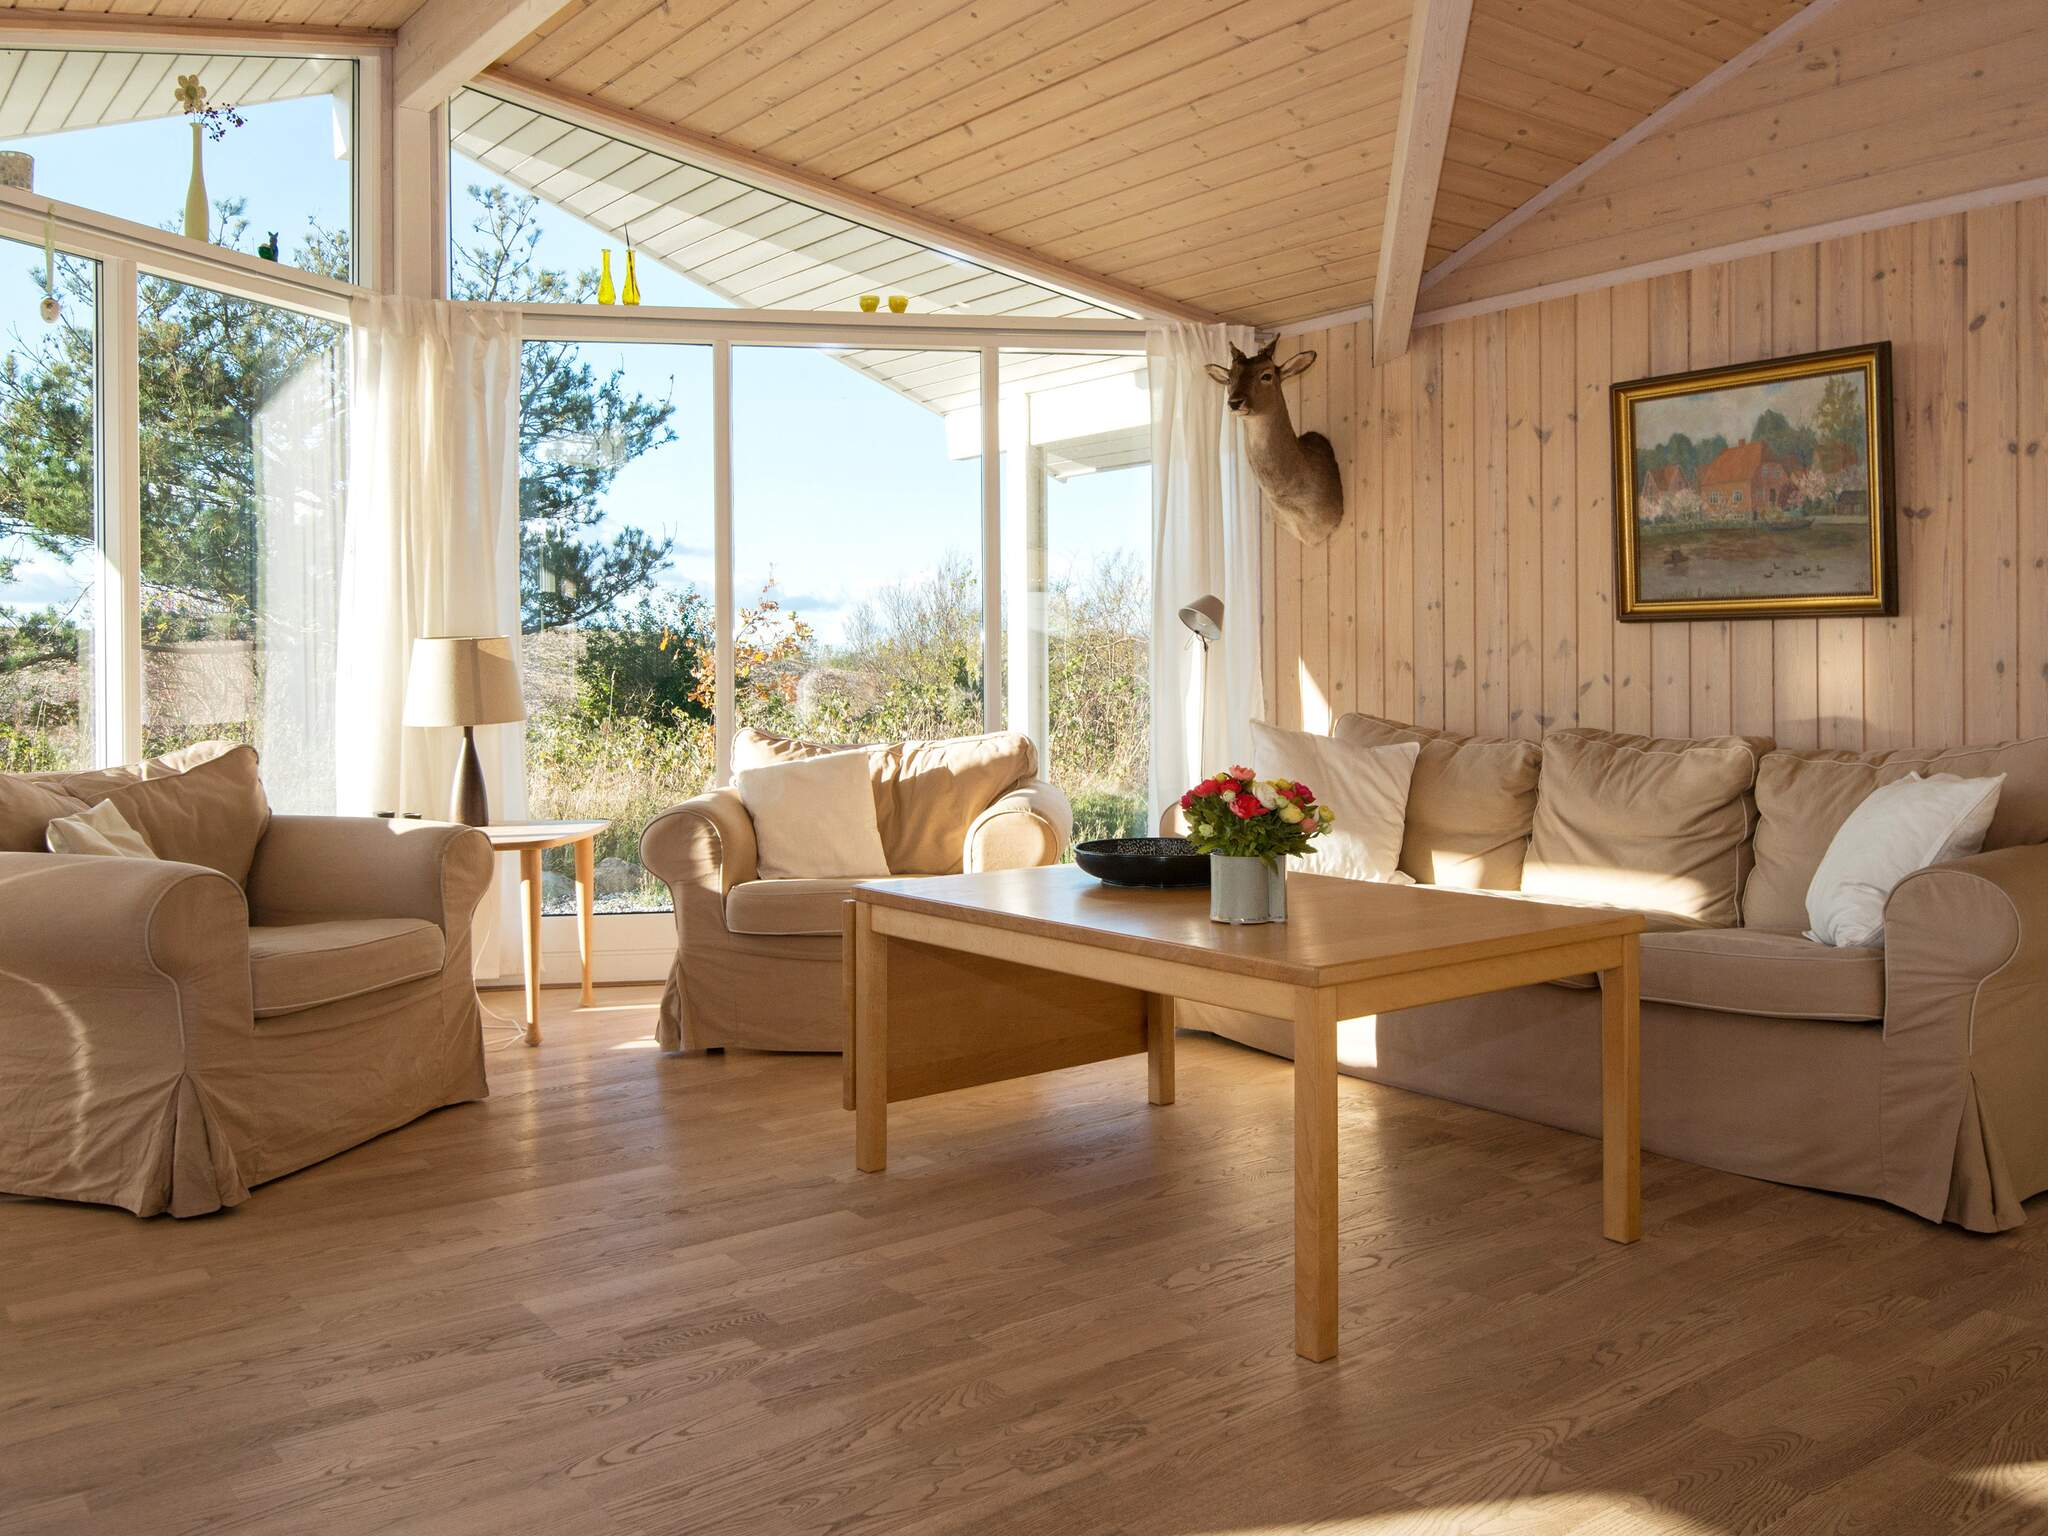 Maison de vacances Helgenæs (681779), Knebel, , Mer Baltique danoise, Danemark, image 2